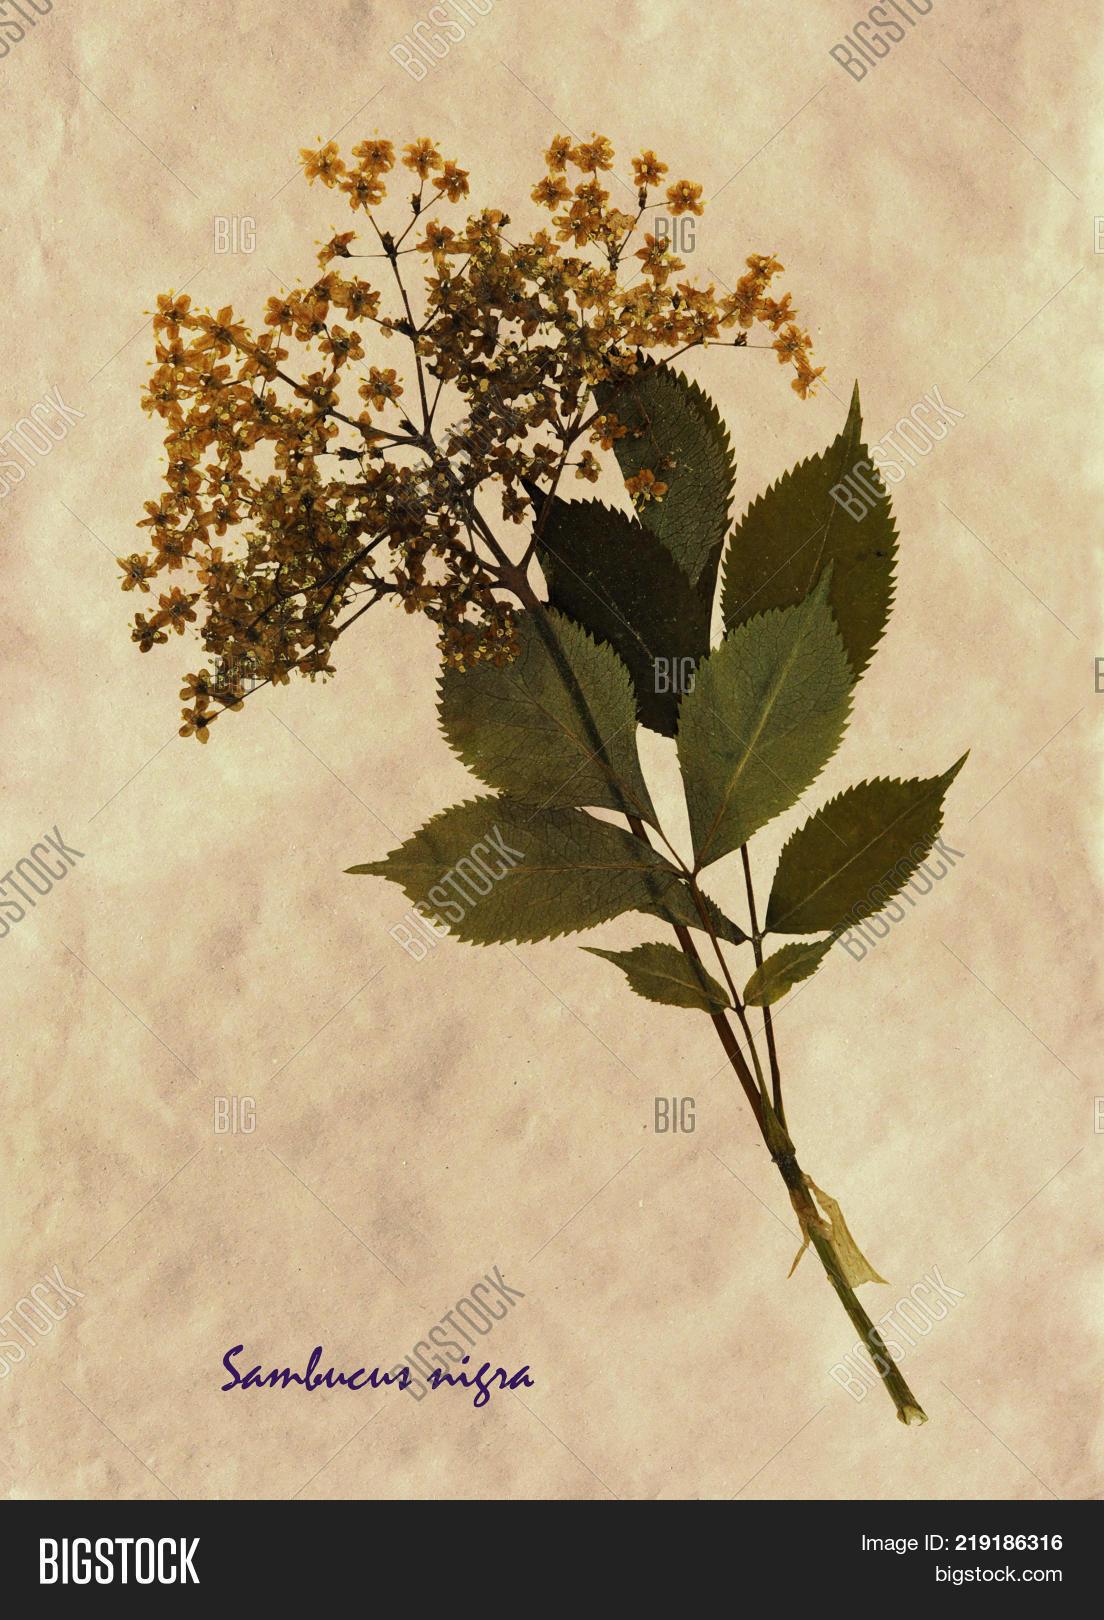 Herbarium Pressed Image Photo Free Trial Bigstock